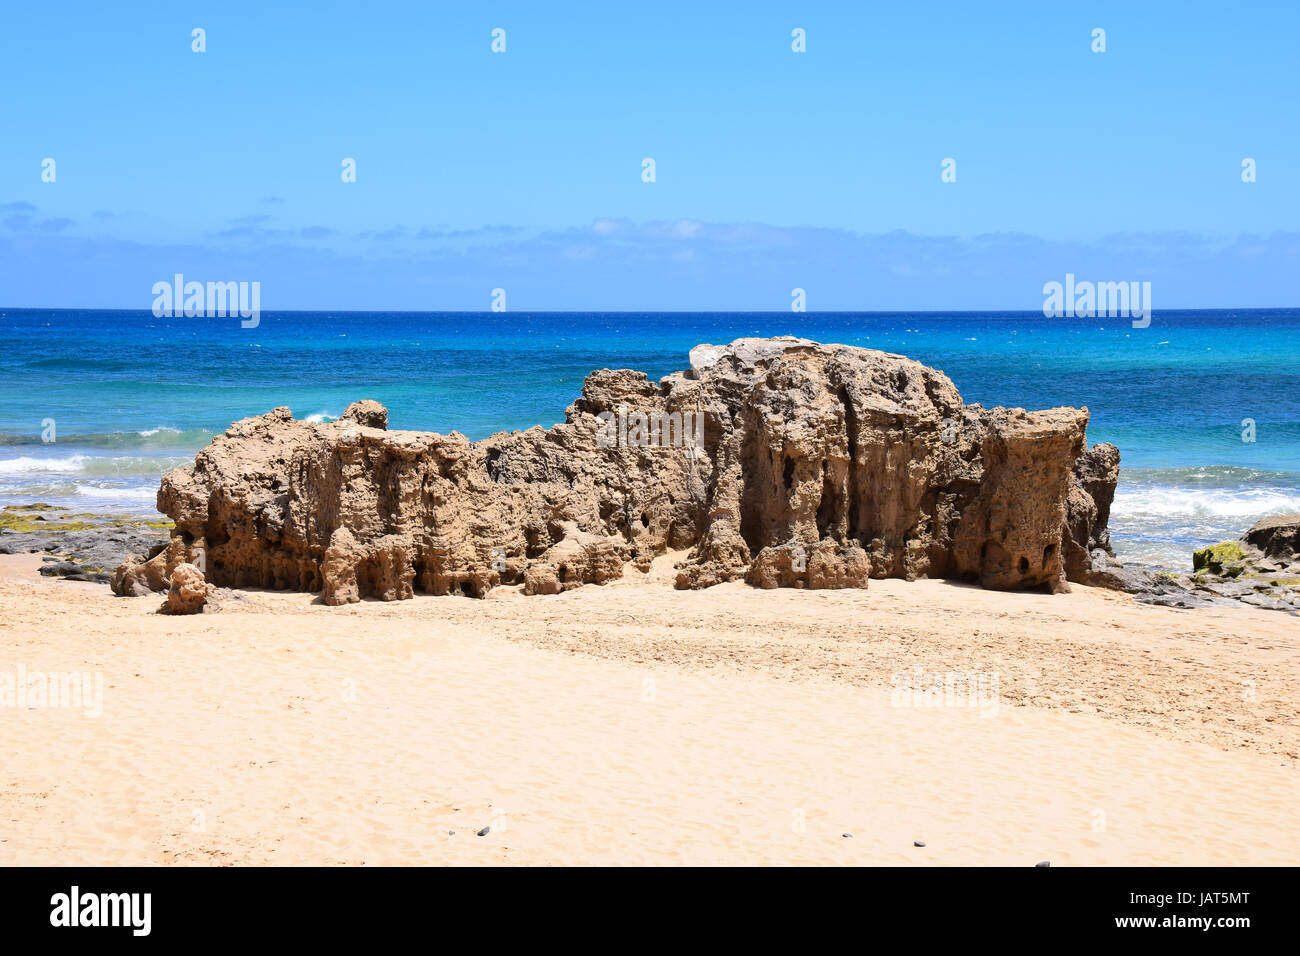 Rocks on the beach at Ponta da Calheta, south west on the island of Porto Santo, 43 miles north of Madeira, Portugal - Stock Image